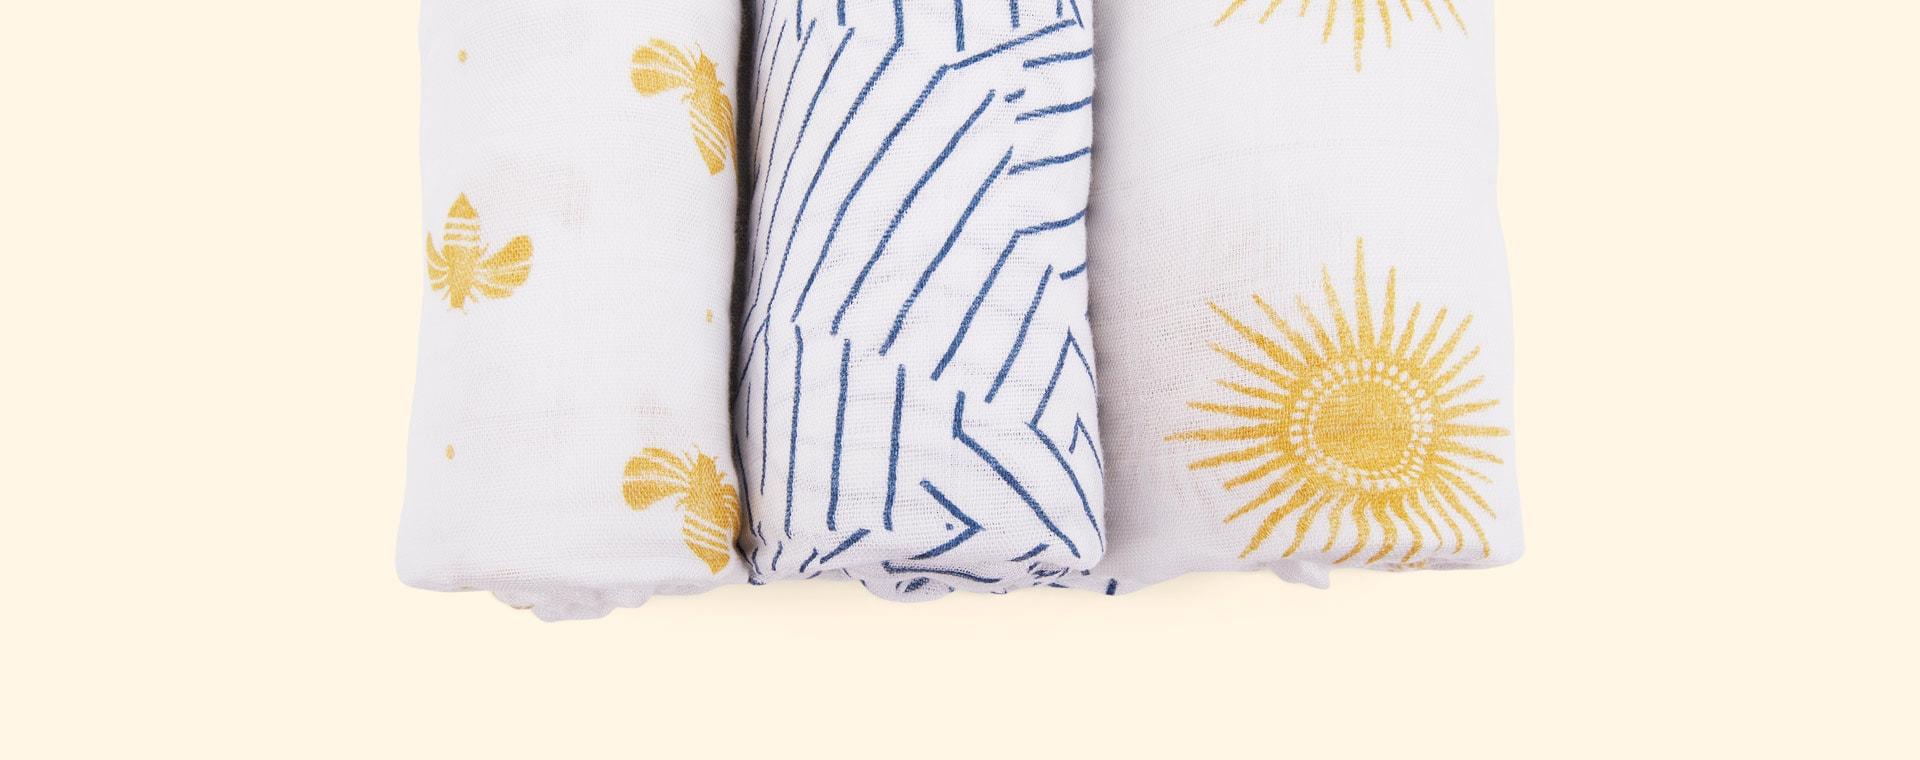 Golden sun aden + anais 3-Pack Silky Soft Swaddle